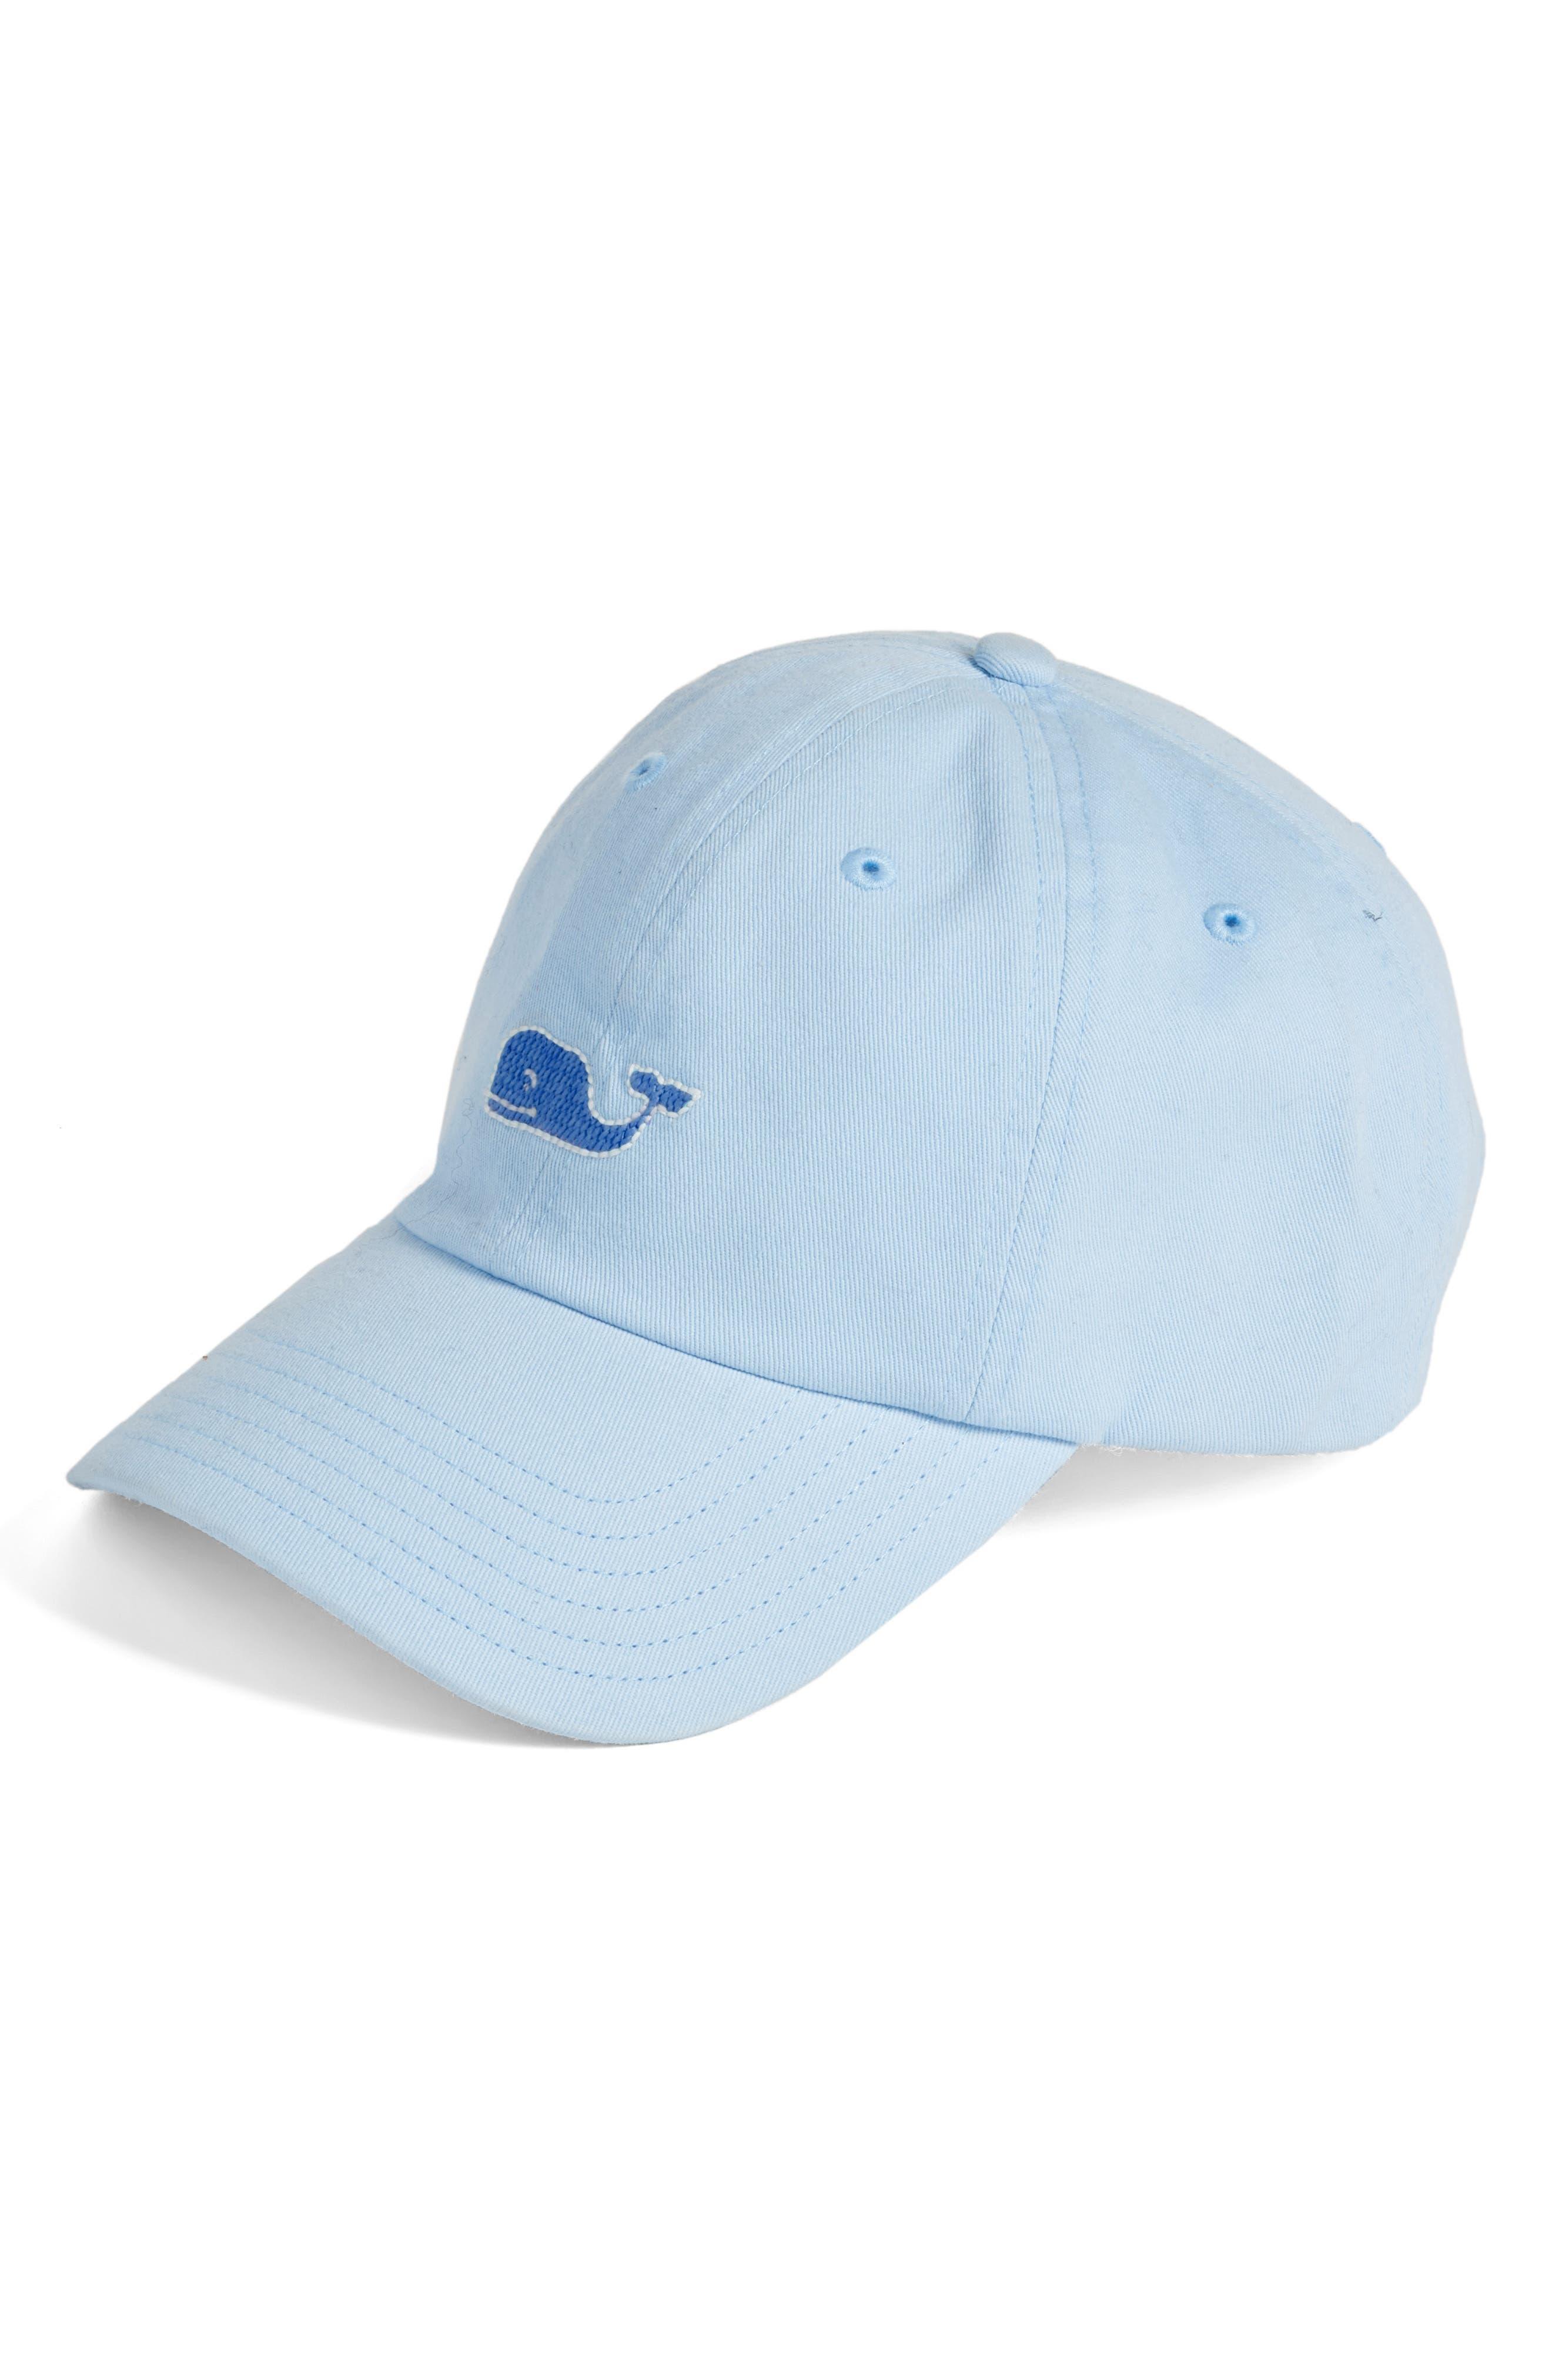 Alternate Image 1 Selected - Vineyard Vines Needlepoint Whale Baseball Cap